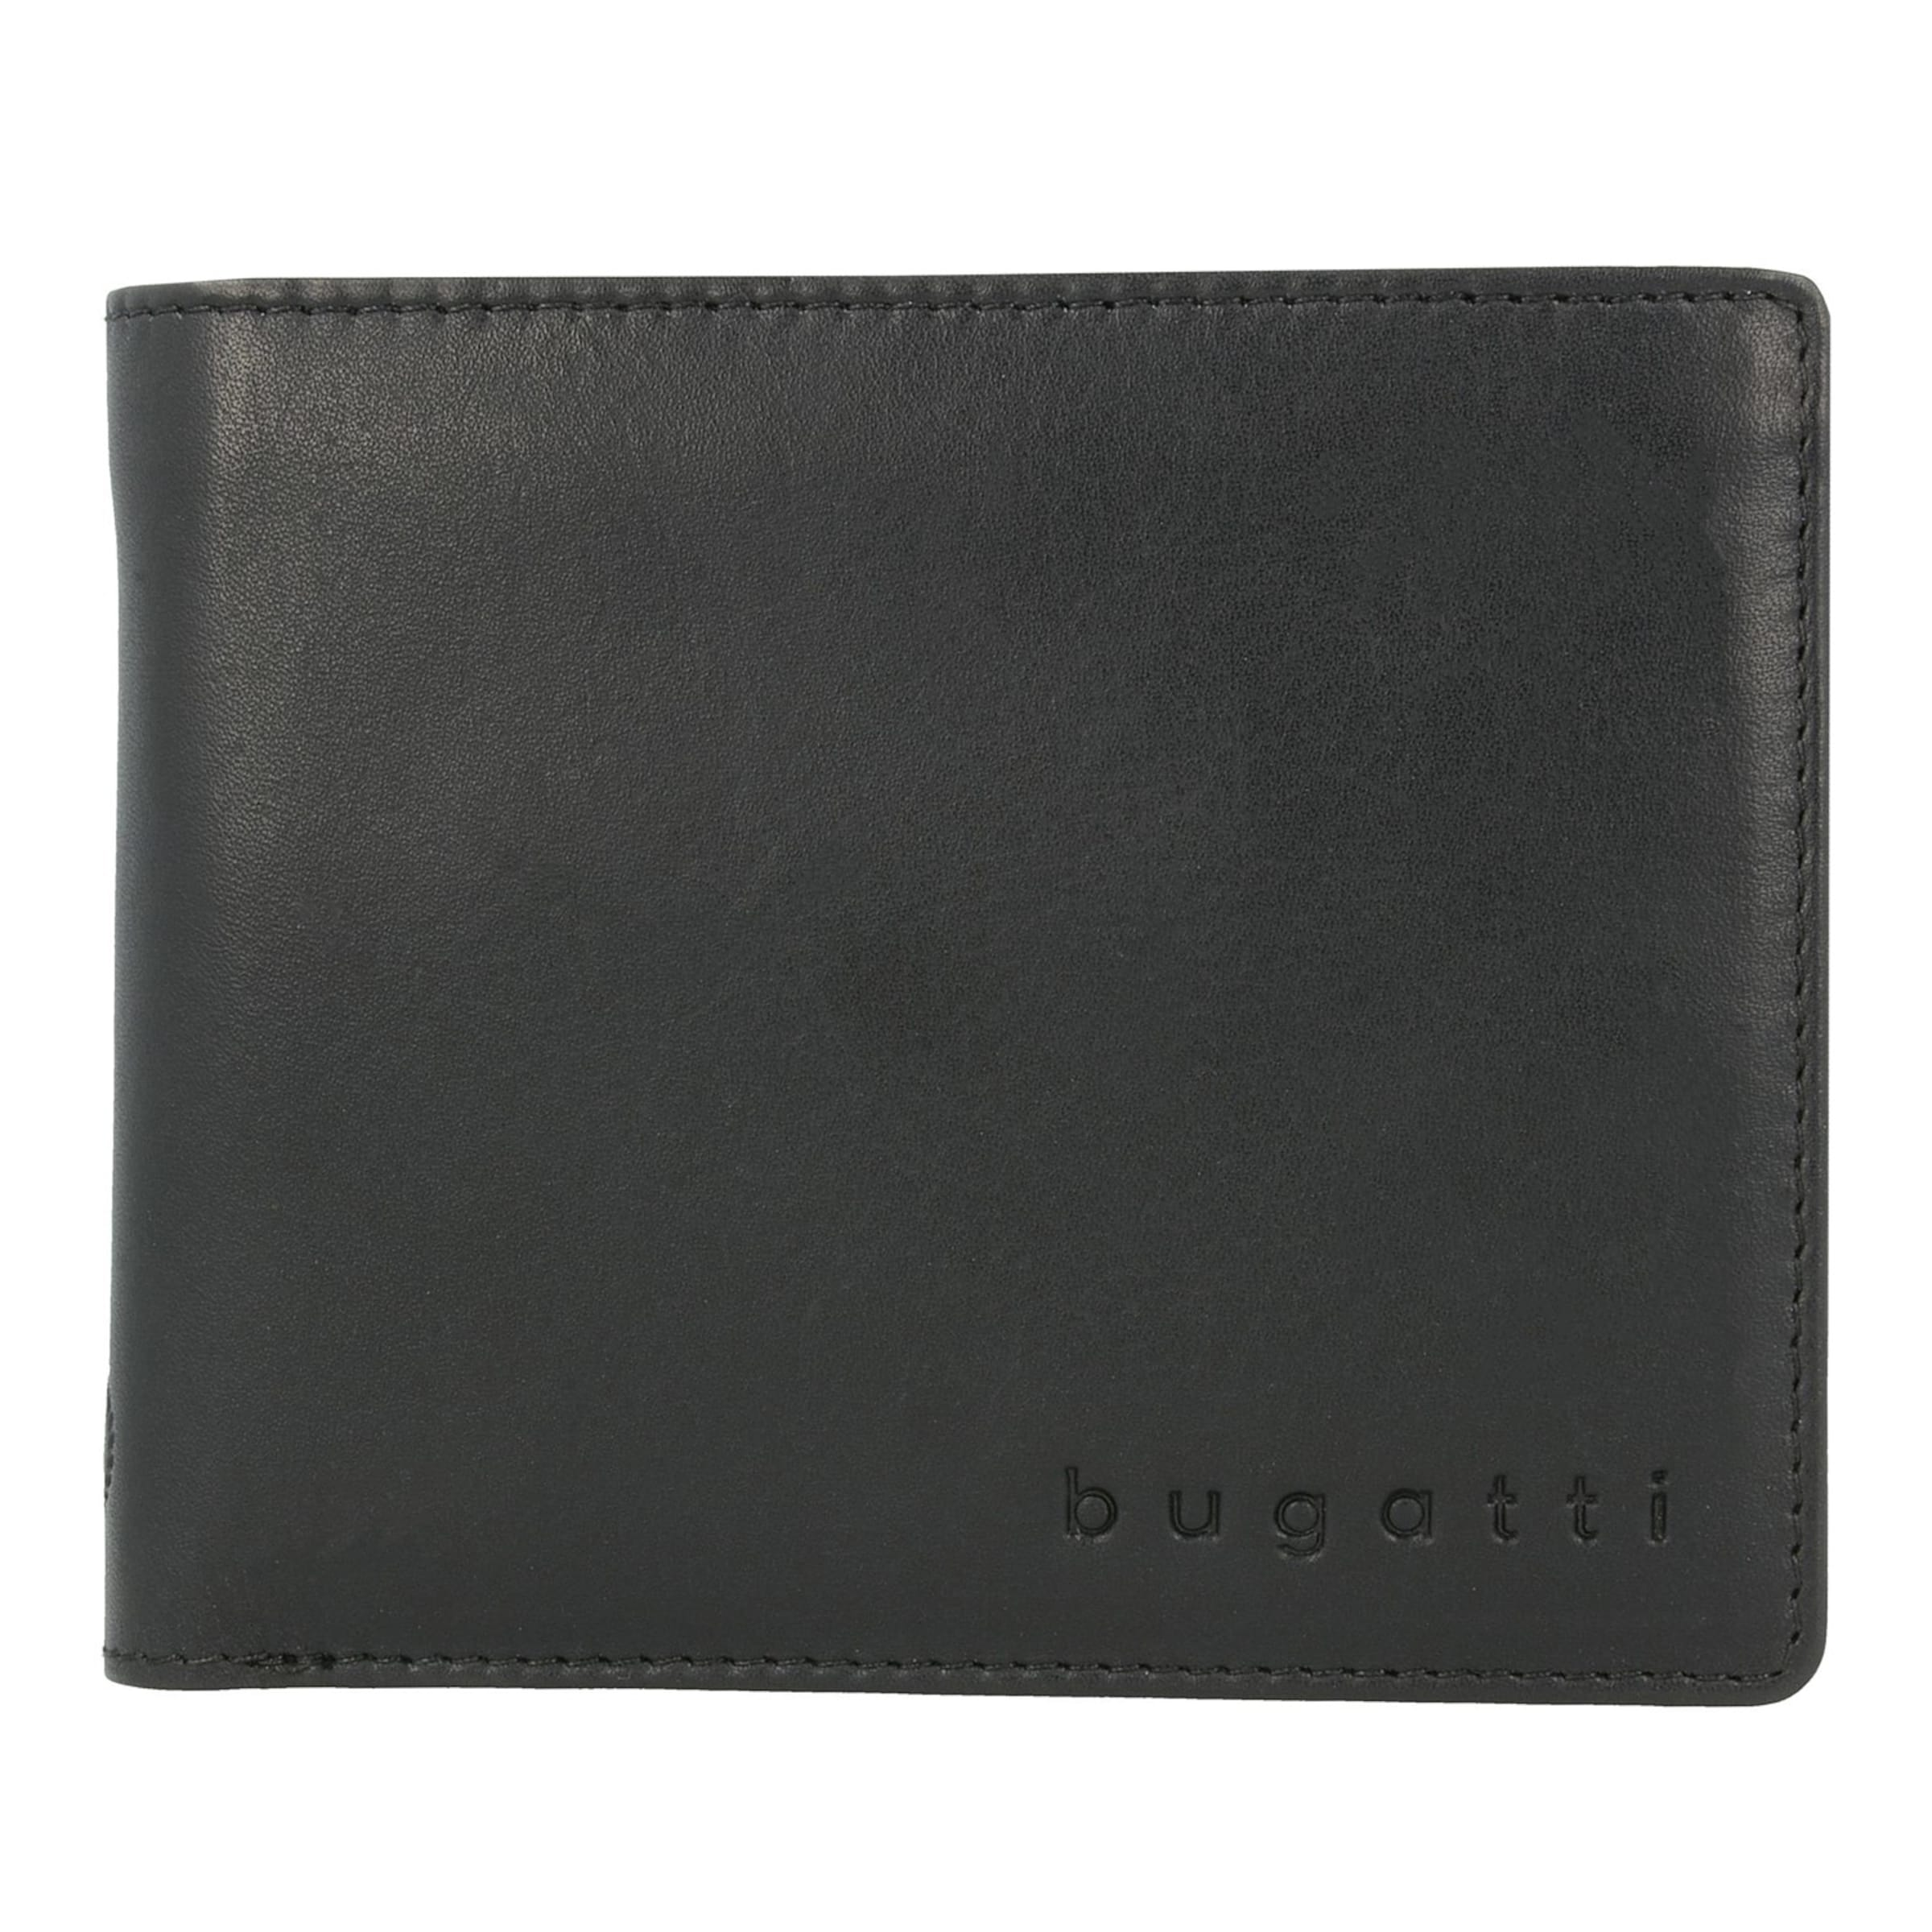 'primo' Bugatti Geldbörse In Bugatti Schwarz Geldbörse lJFK3Tcu1